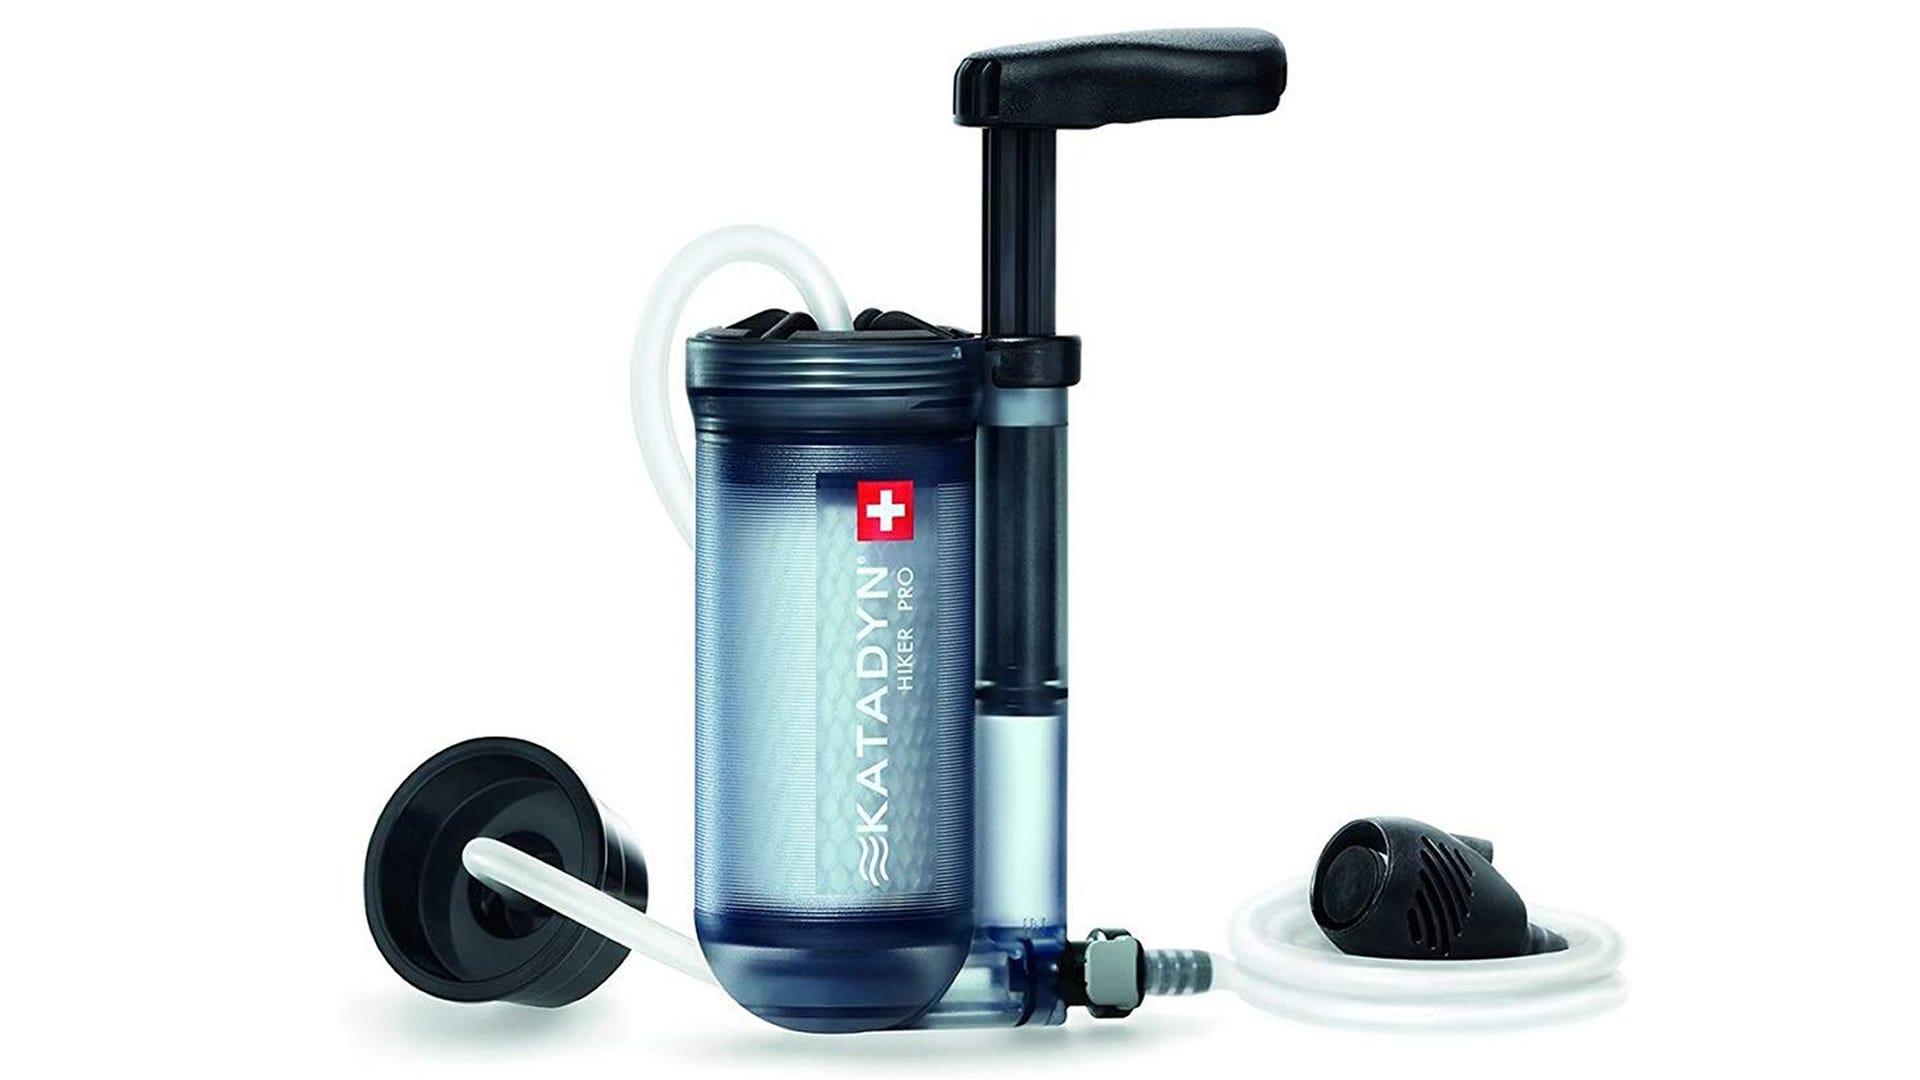 Katadyn Hiker Pro backpacking water filter